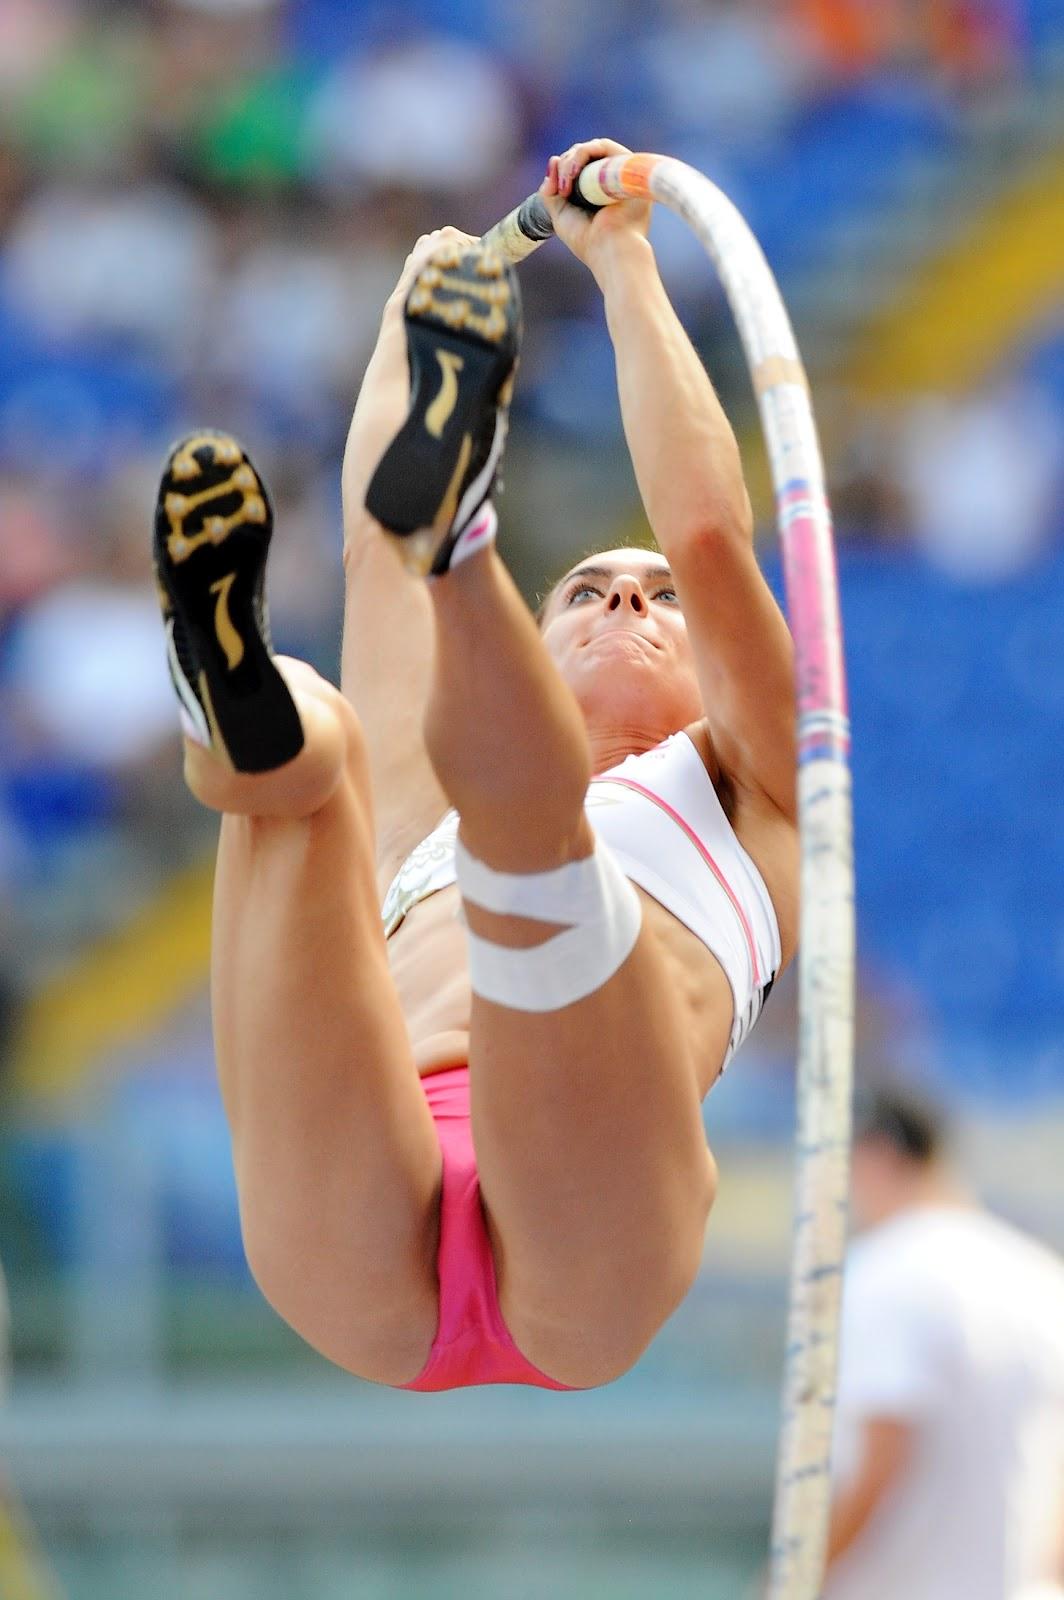 Sexy Sport Girl Porn